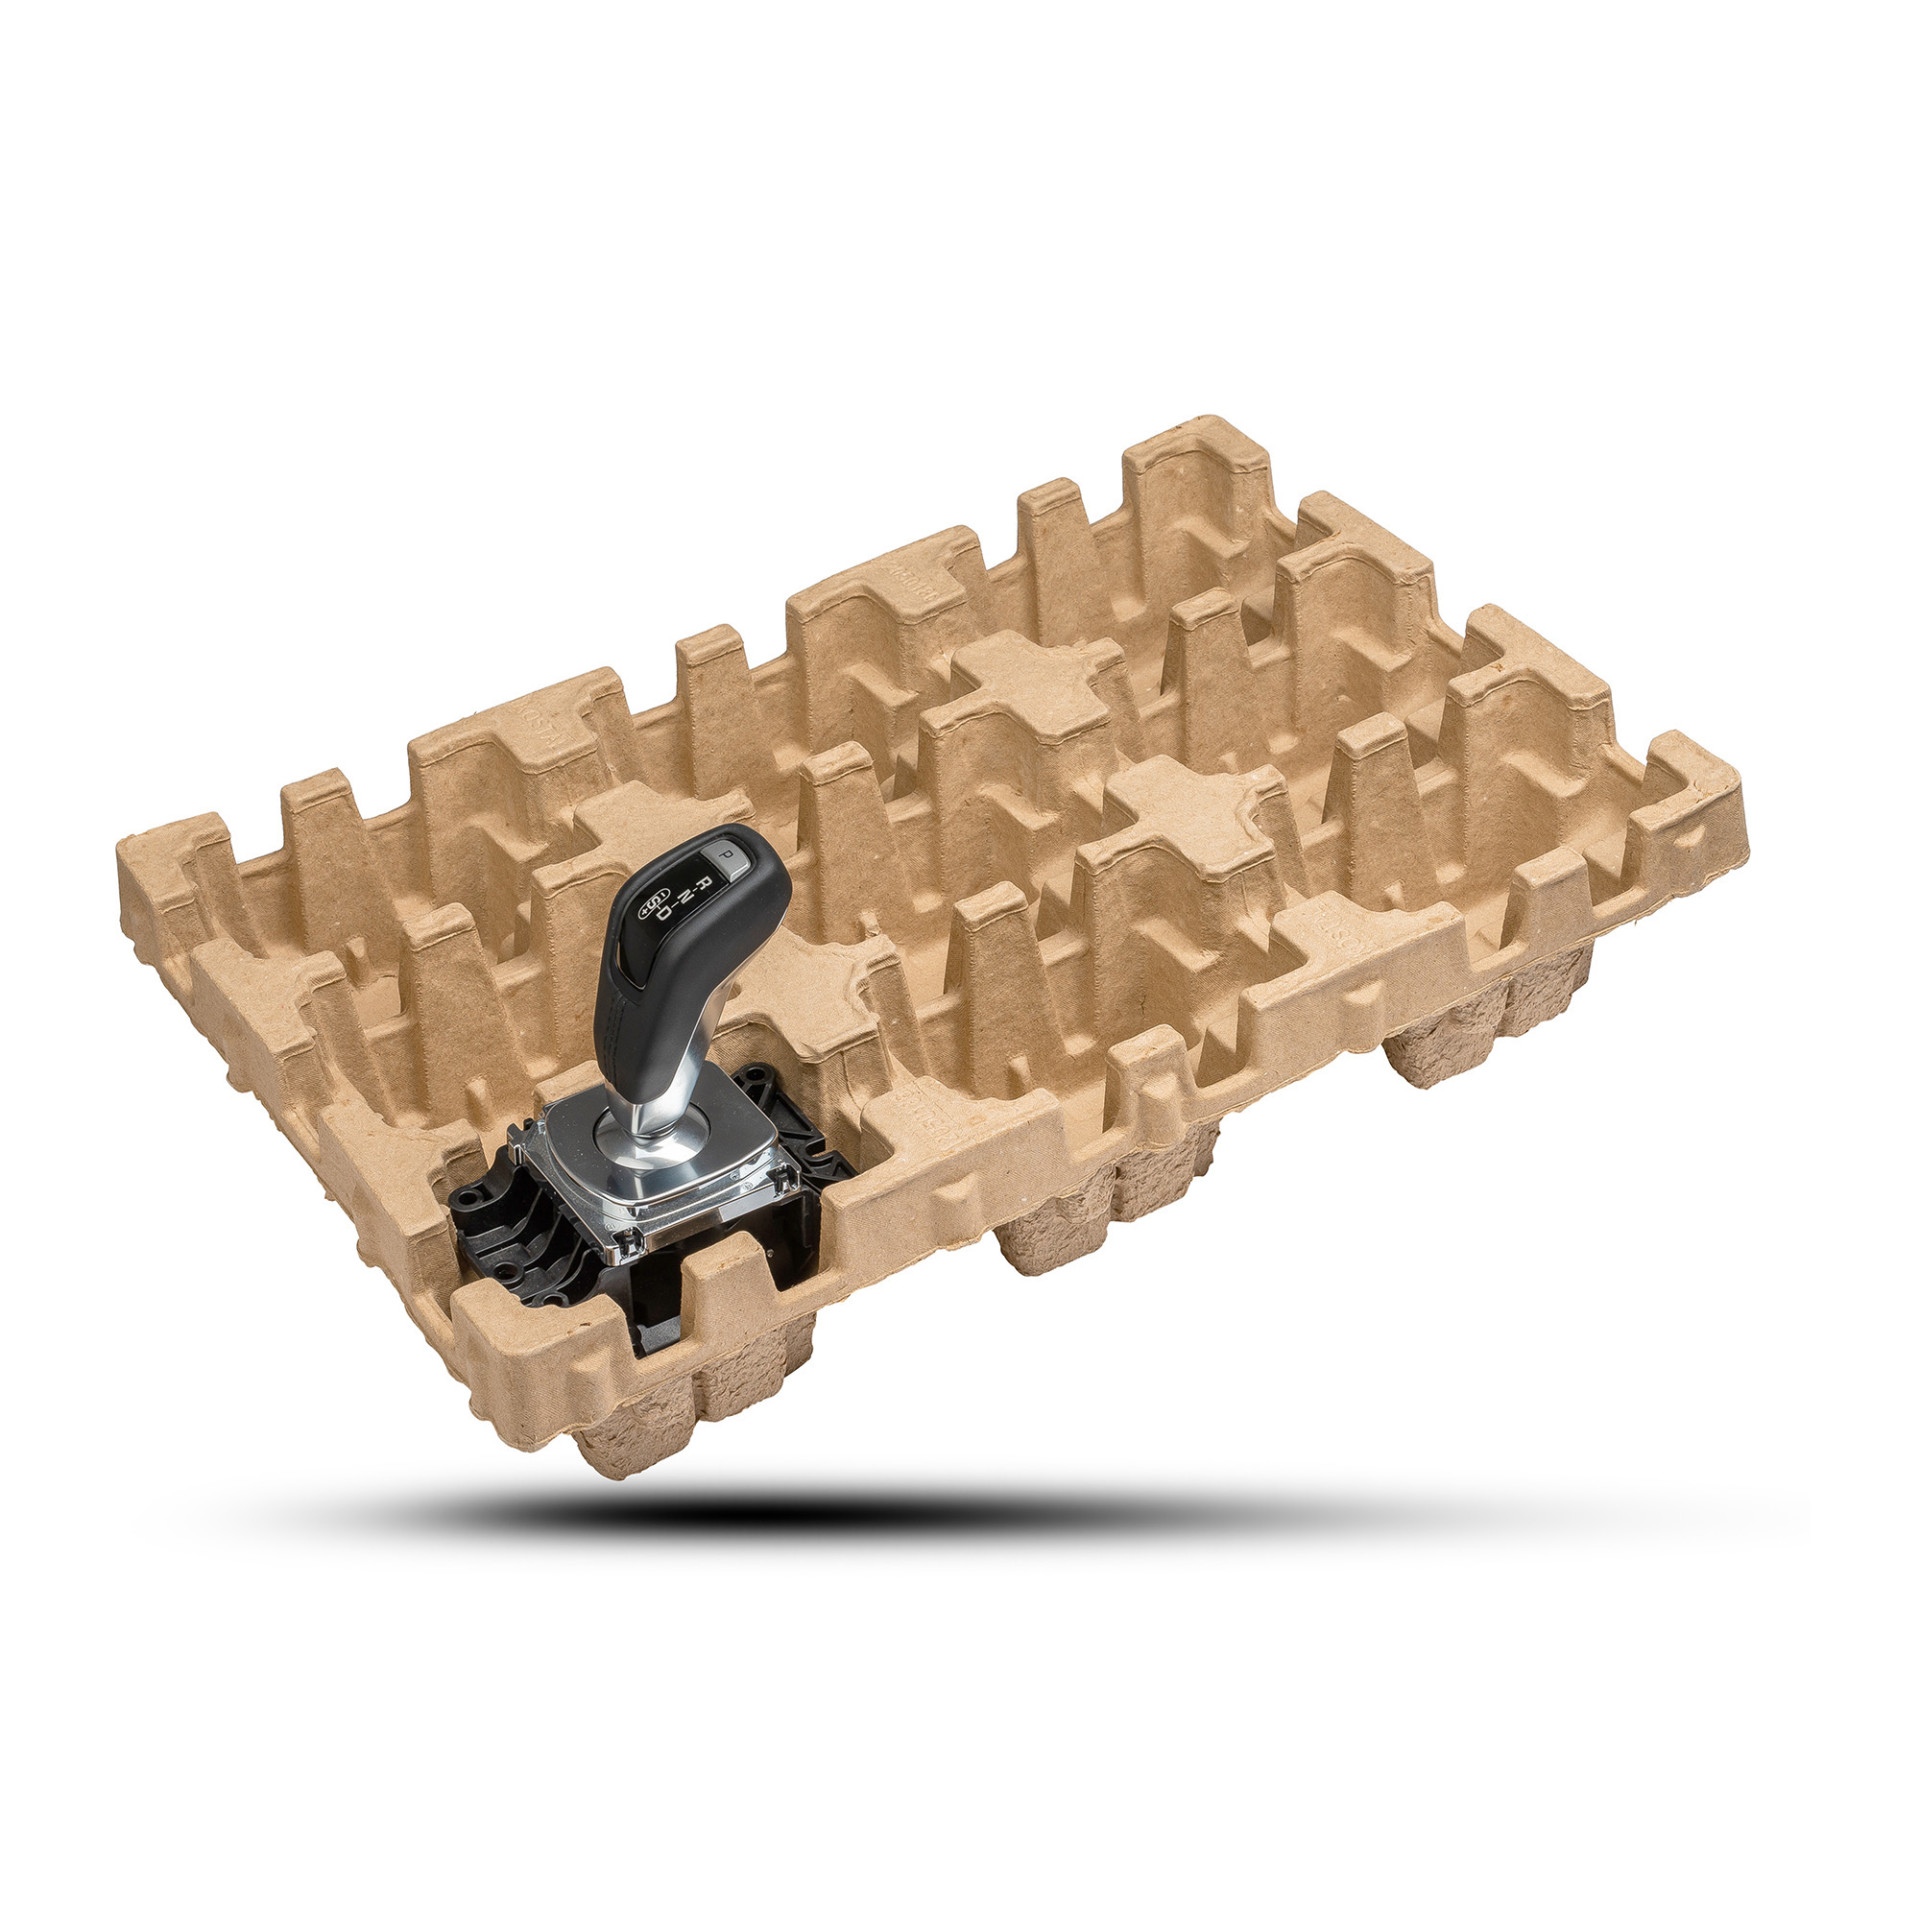 Pulp-Tec Faserguss Verpackung Automotive